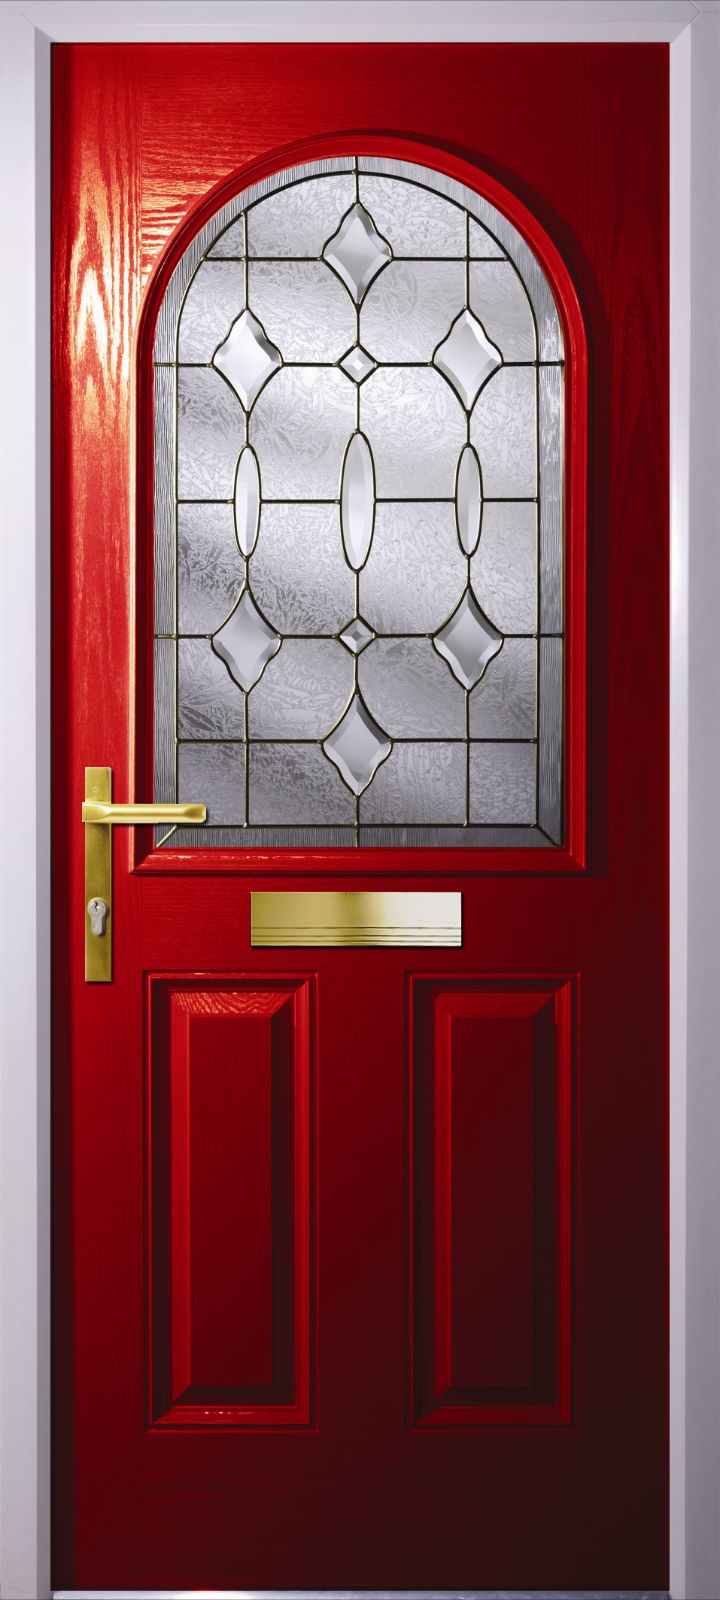 19 Best Red Doors Images On Pinterest